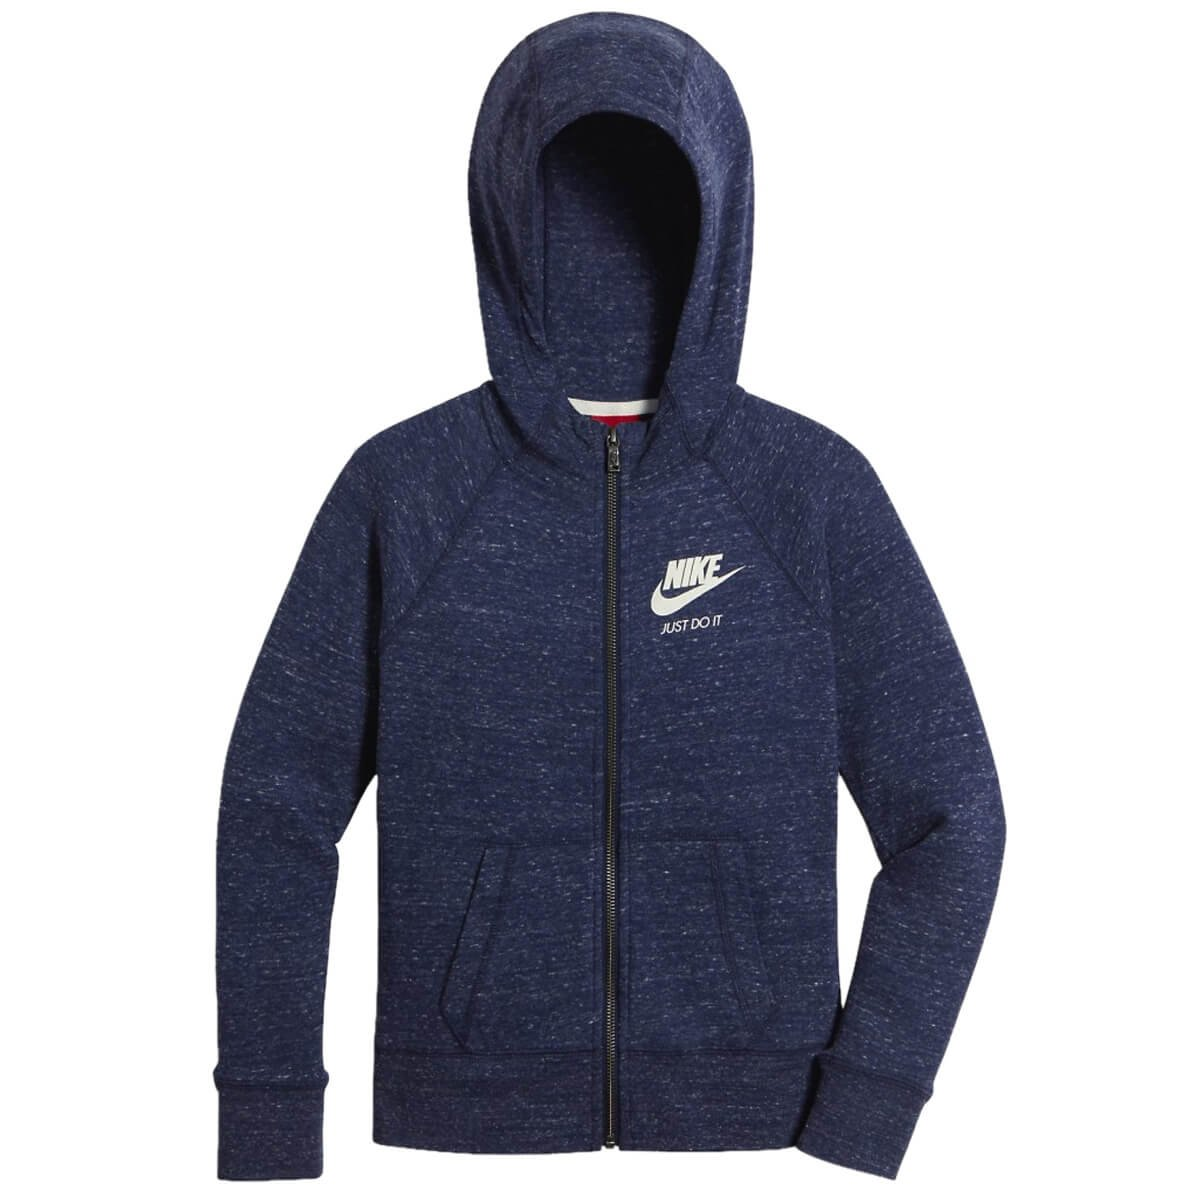 7697615c6 Bizz Store - Jaqueta Infantil Nike Gym Vintage FZ Hoodie